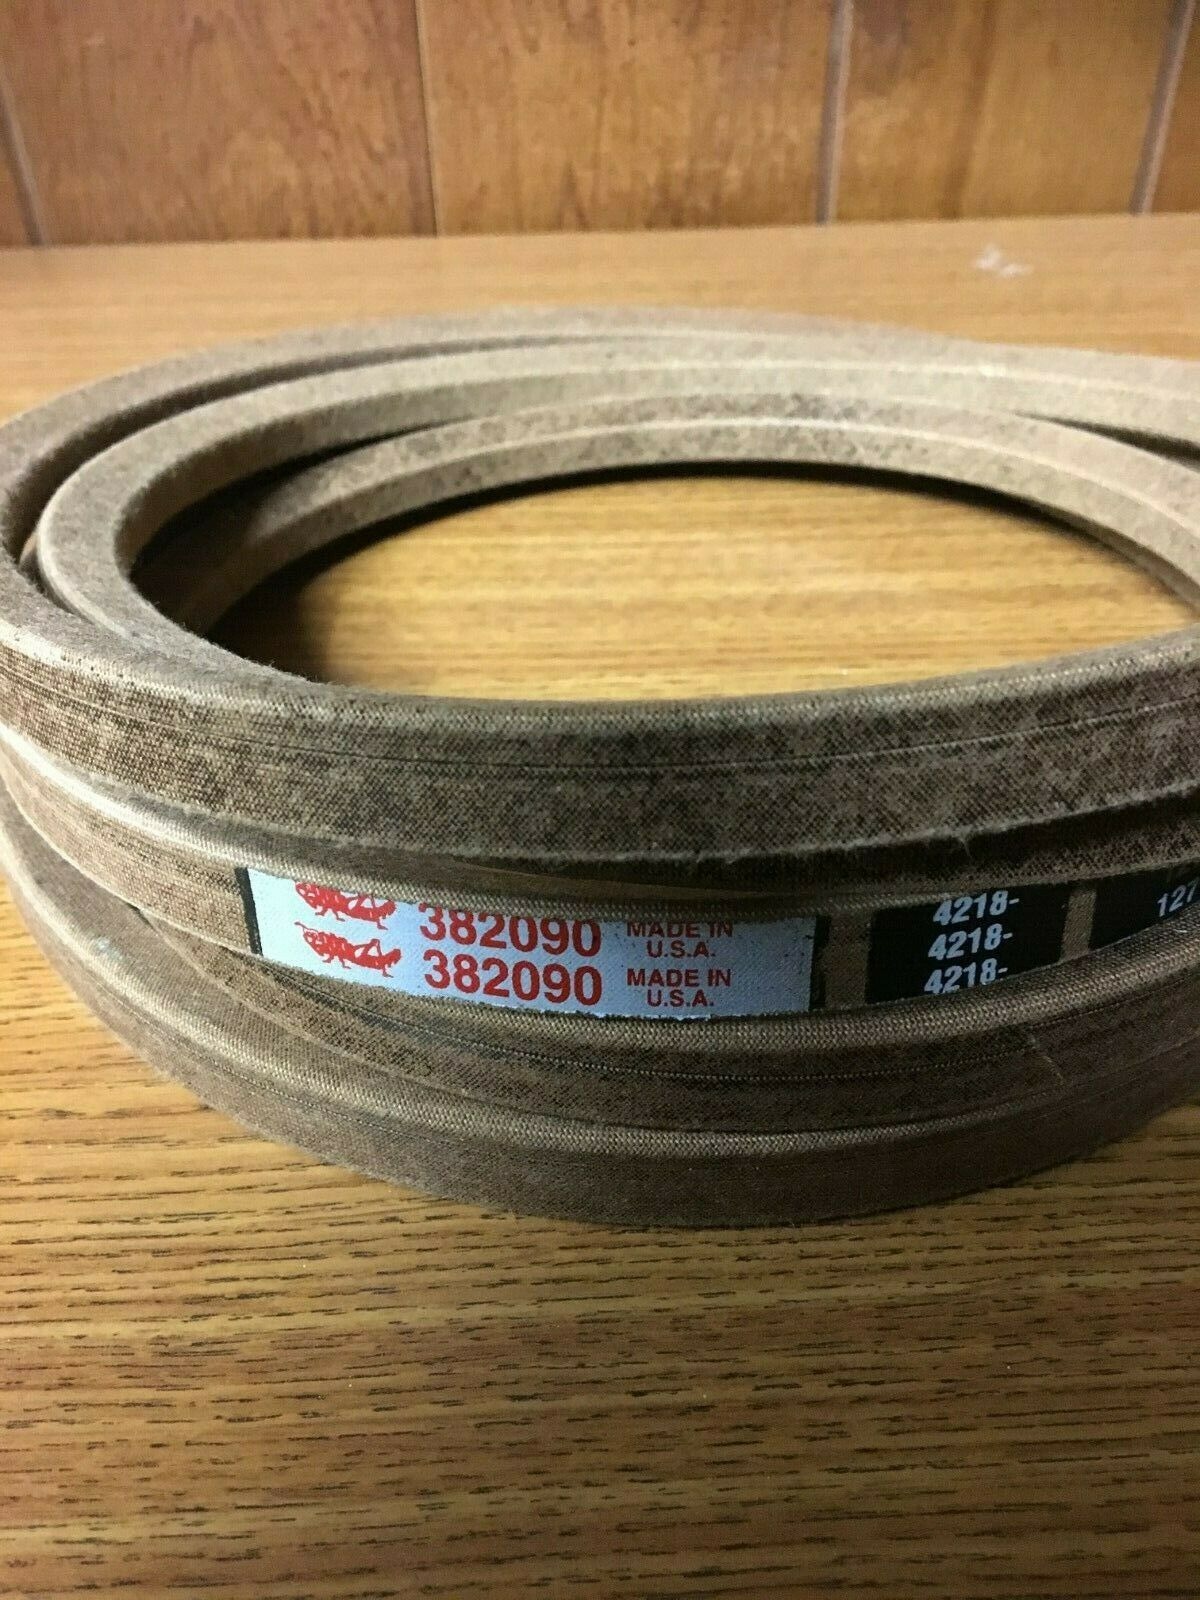 Grasshopper OEM Replacement Belt 382090 5//8x141